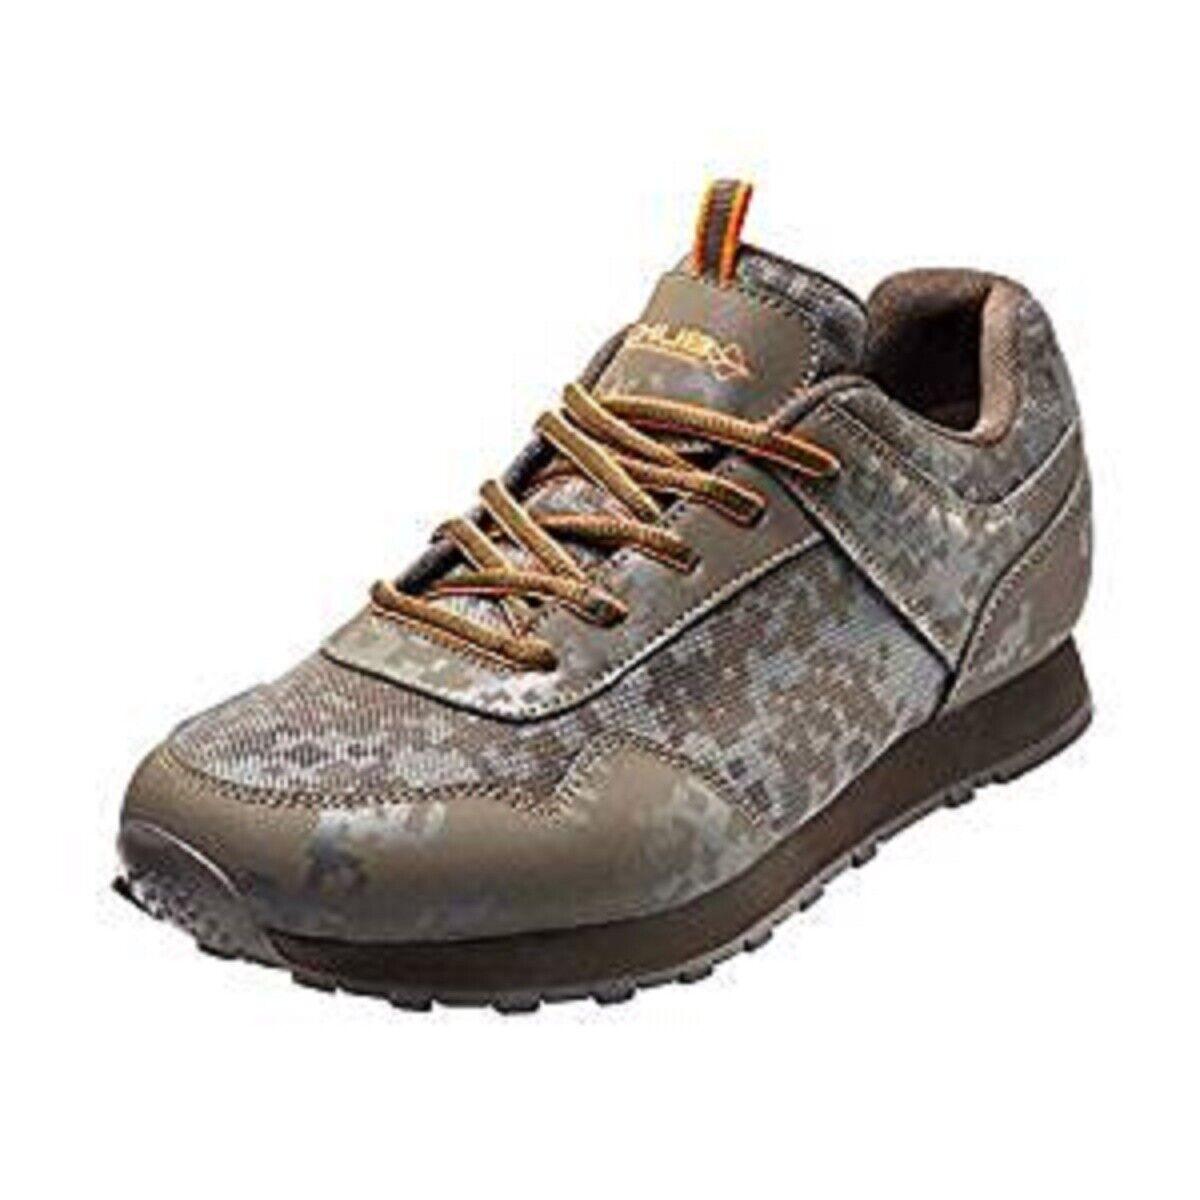 Chub Vantage Camo Trainers Größe 44 (10)  Schuhe Angelschuhe Stiefel Outdoor